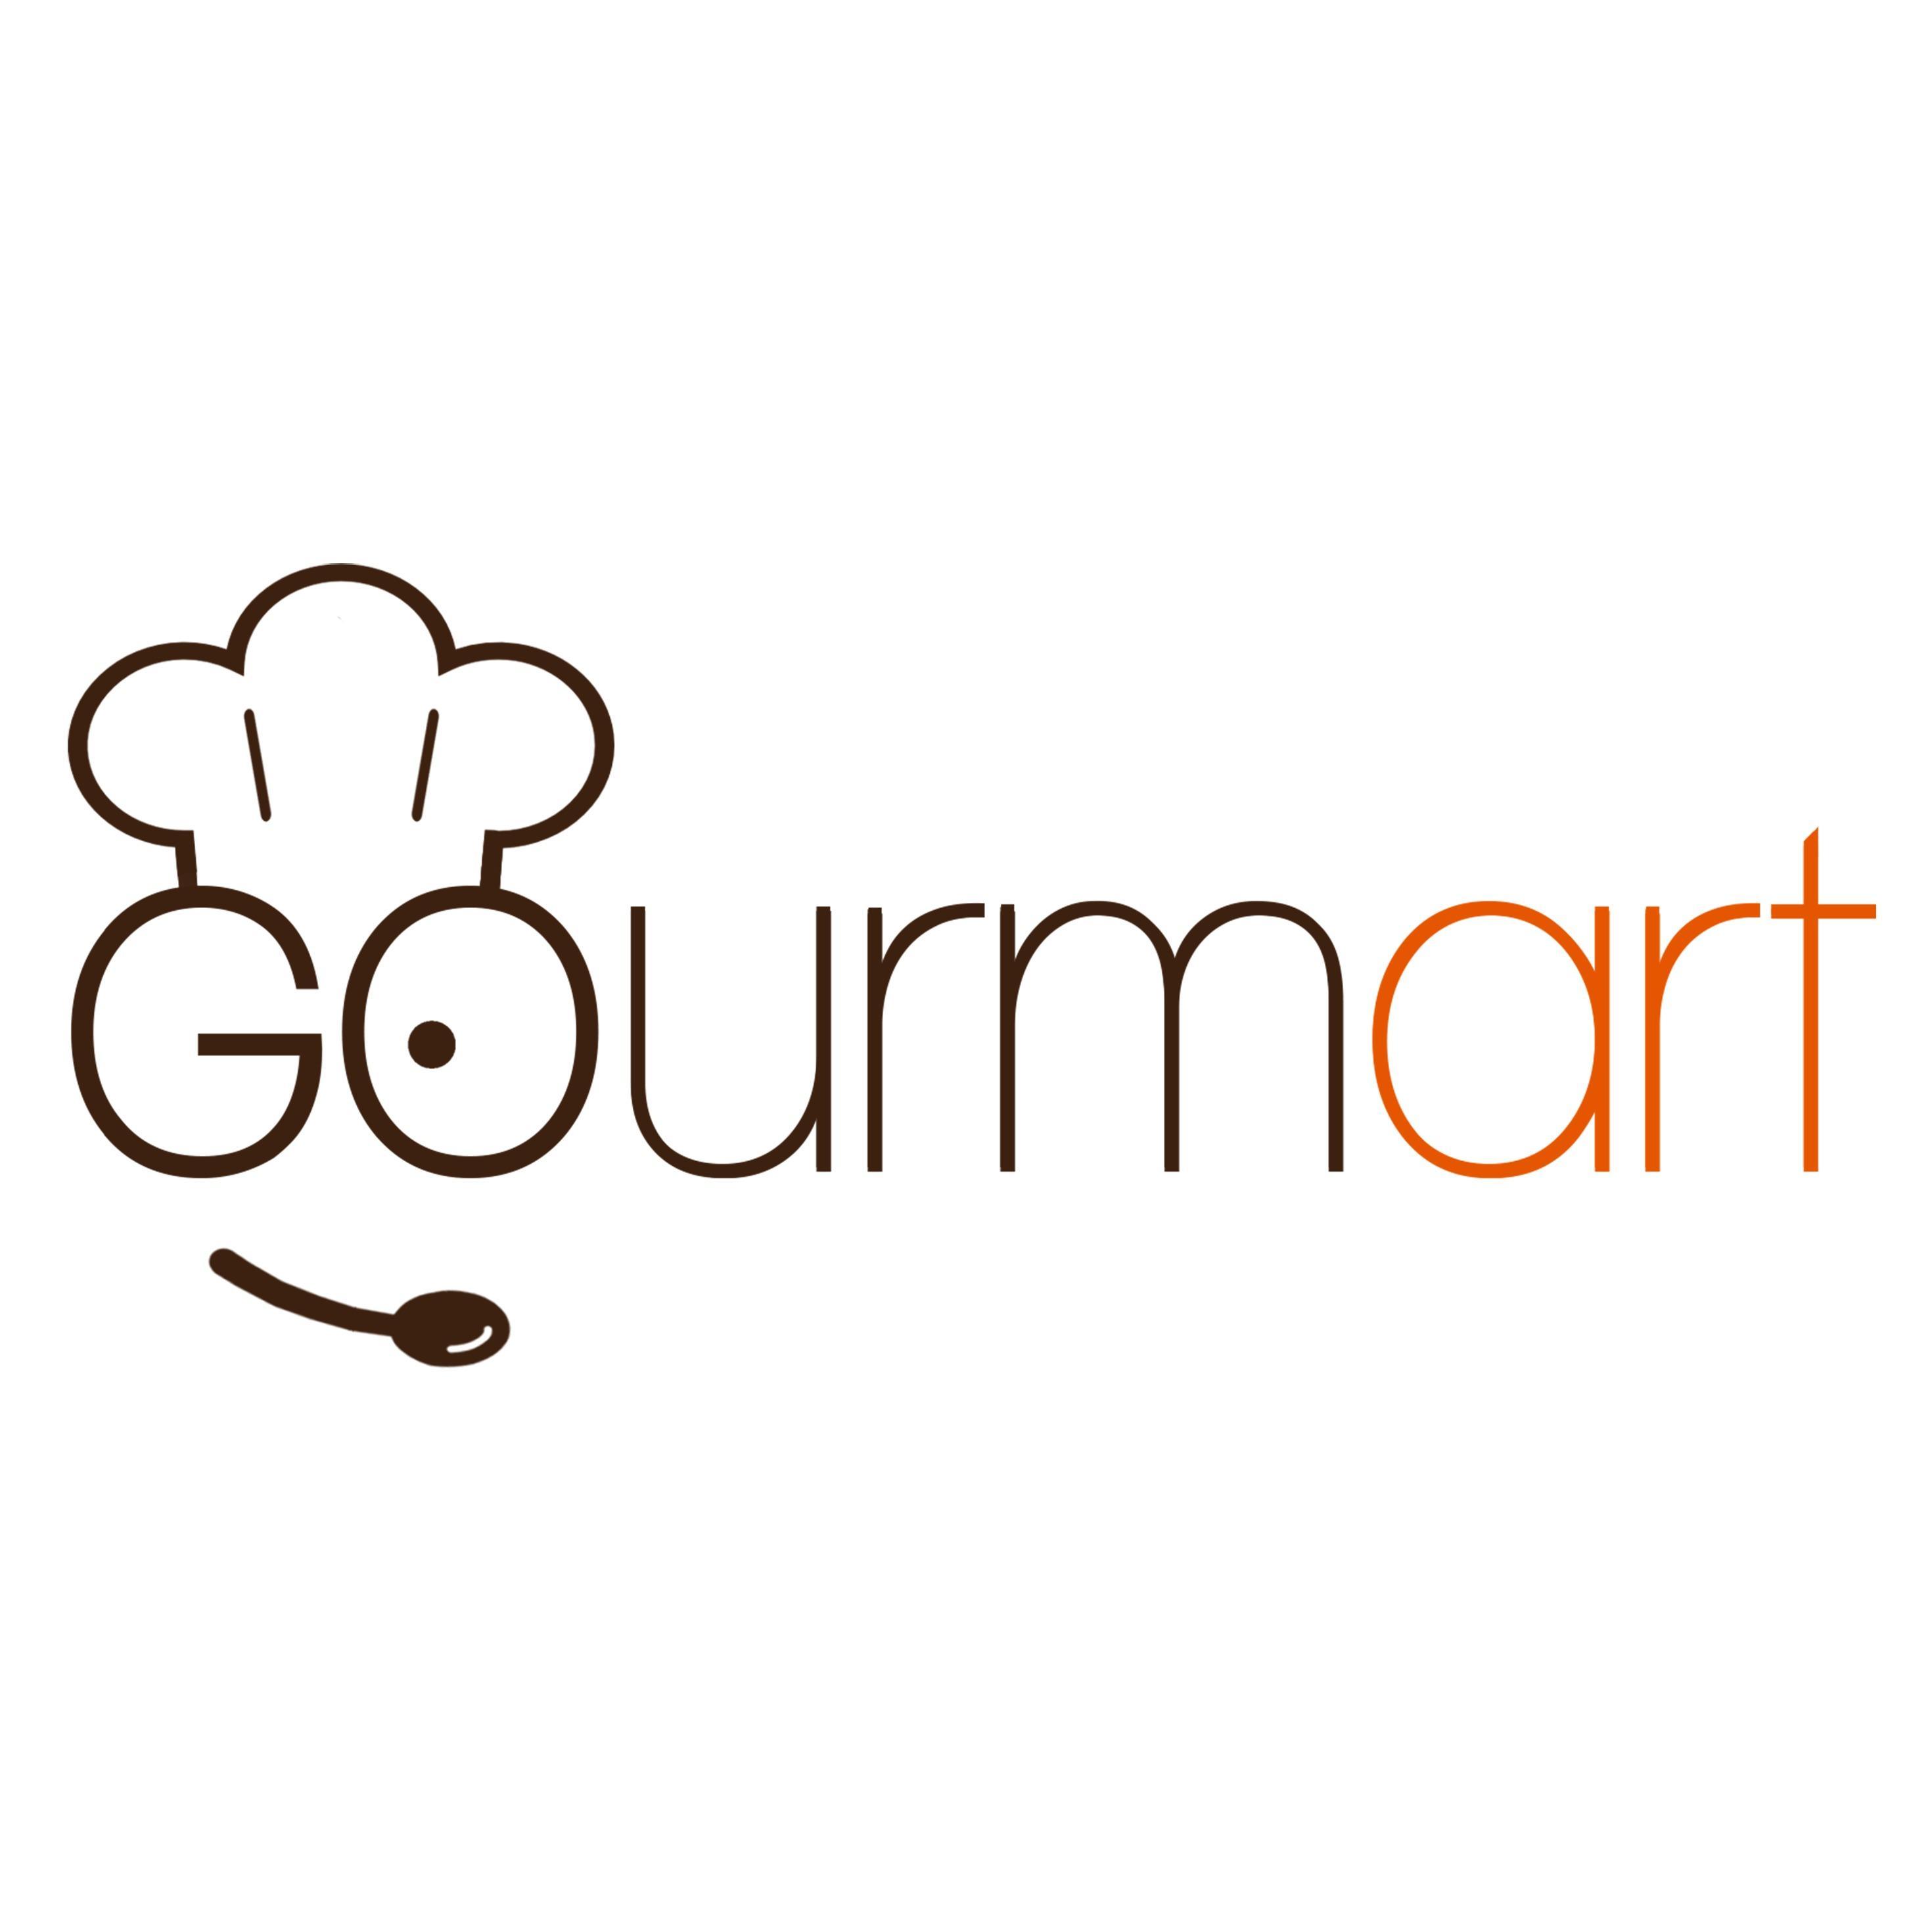 Gourmart